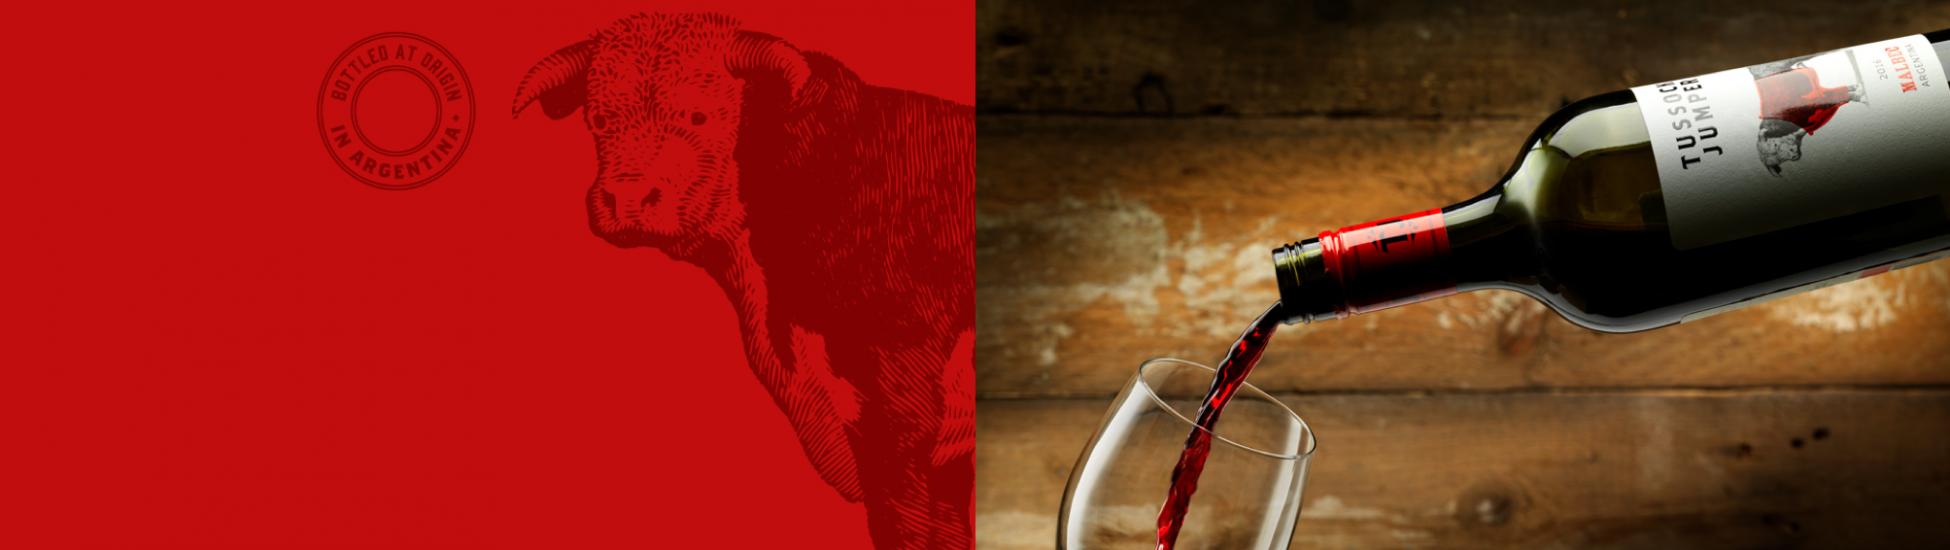 Tussock Jumper Wines - Argentina - Malbec